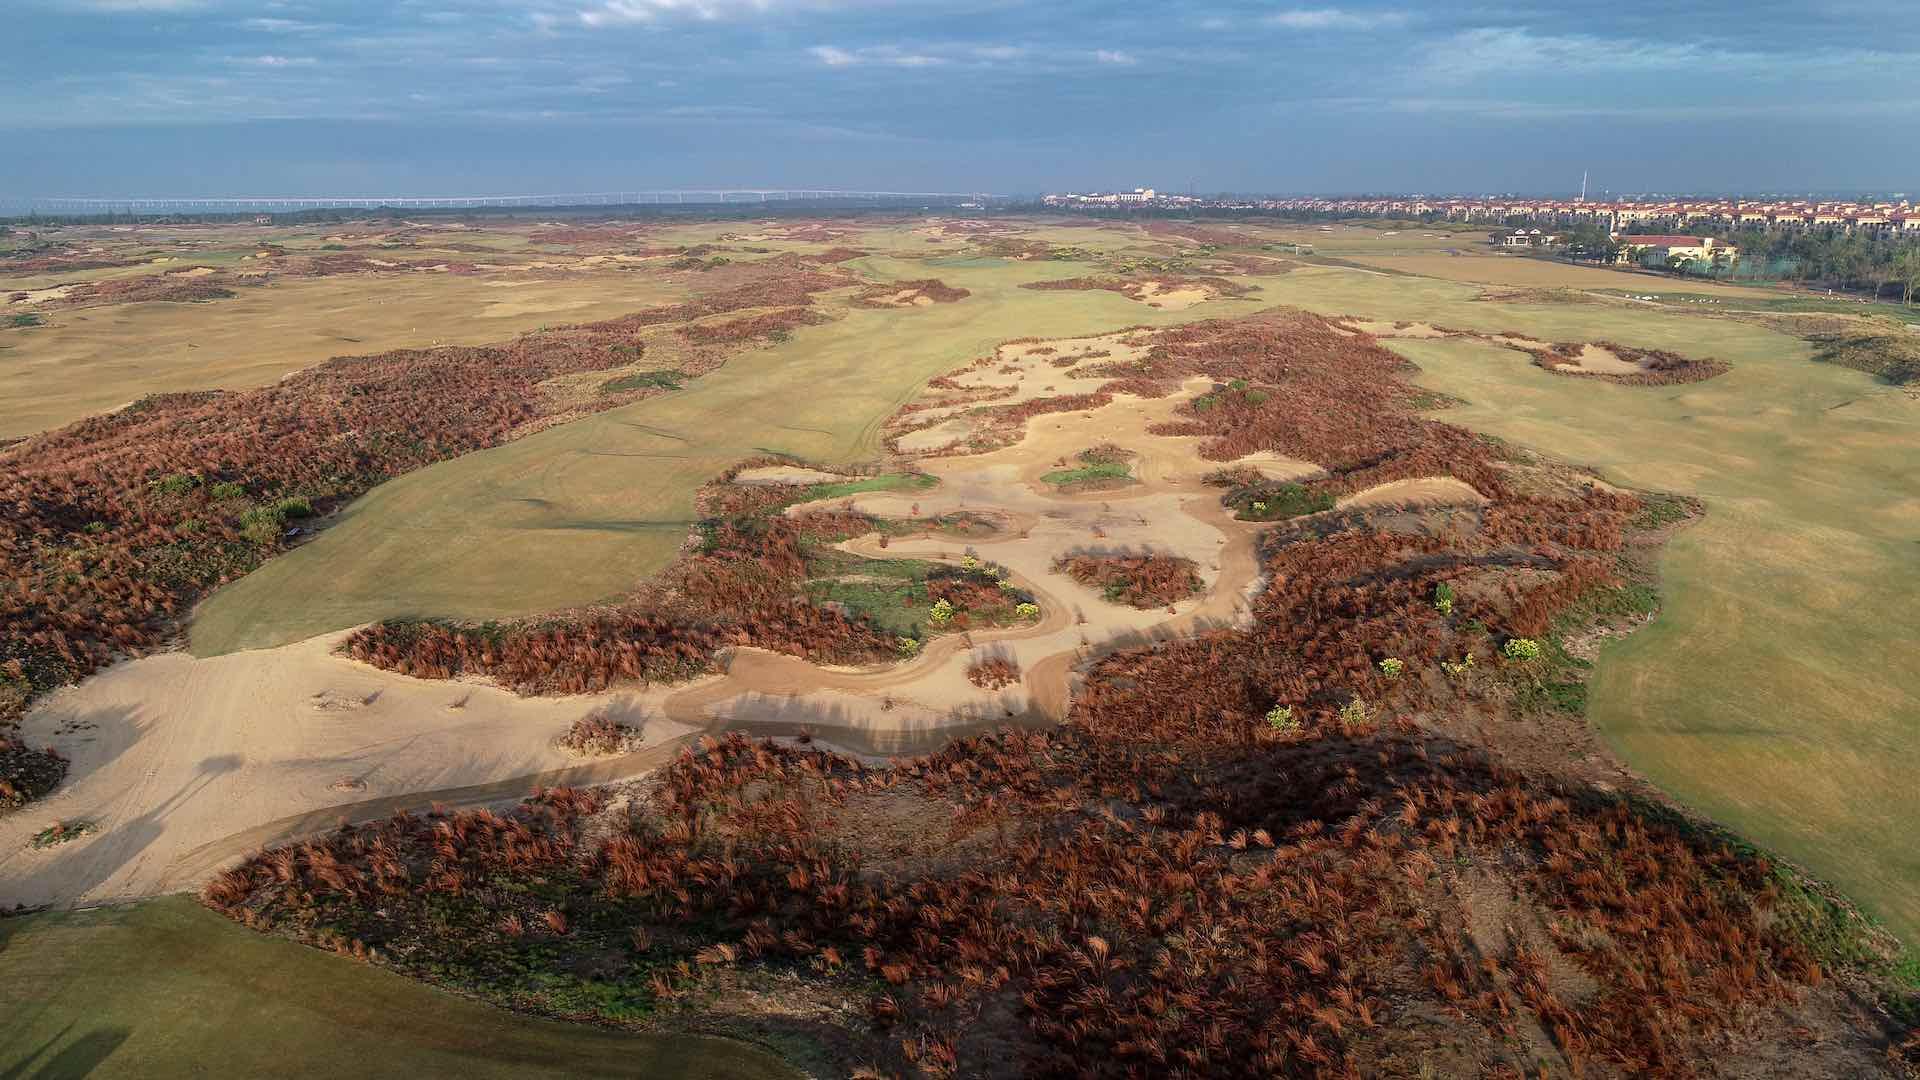 Yangtze Dunes course reopens